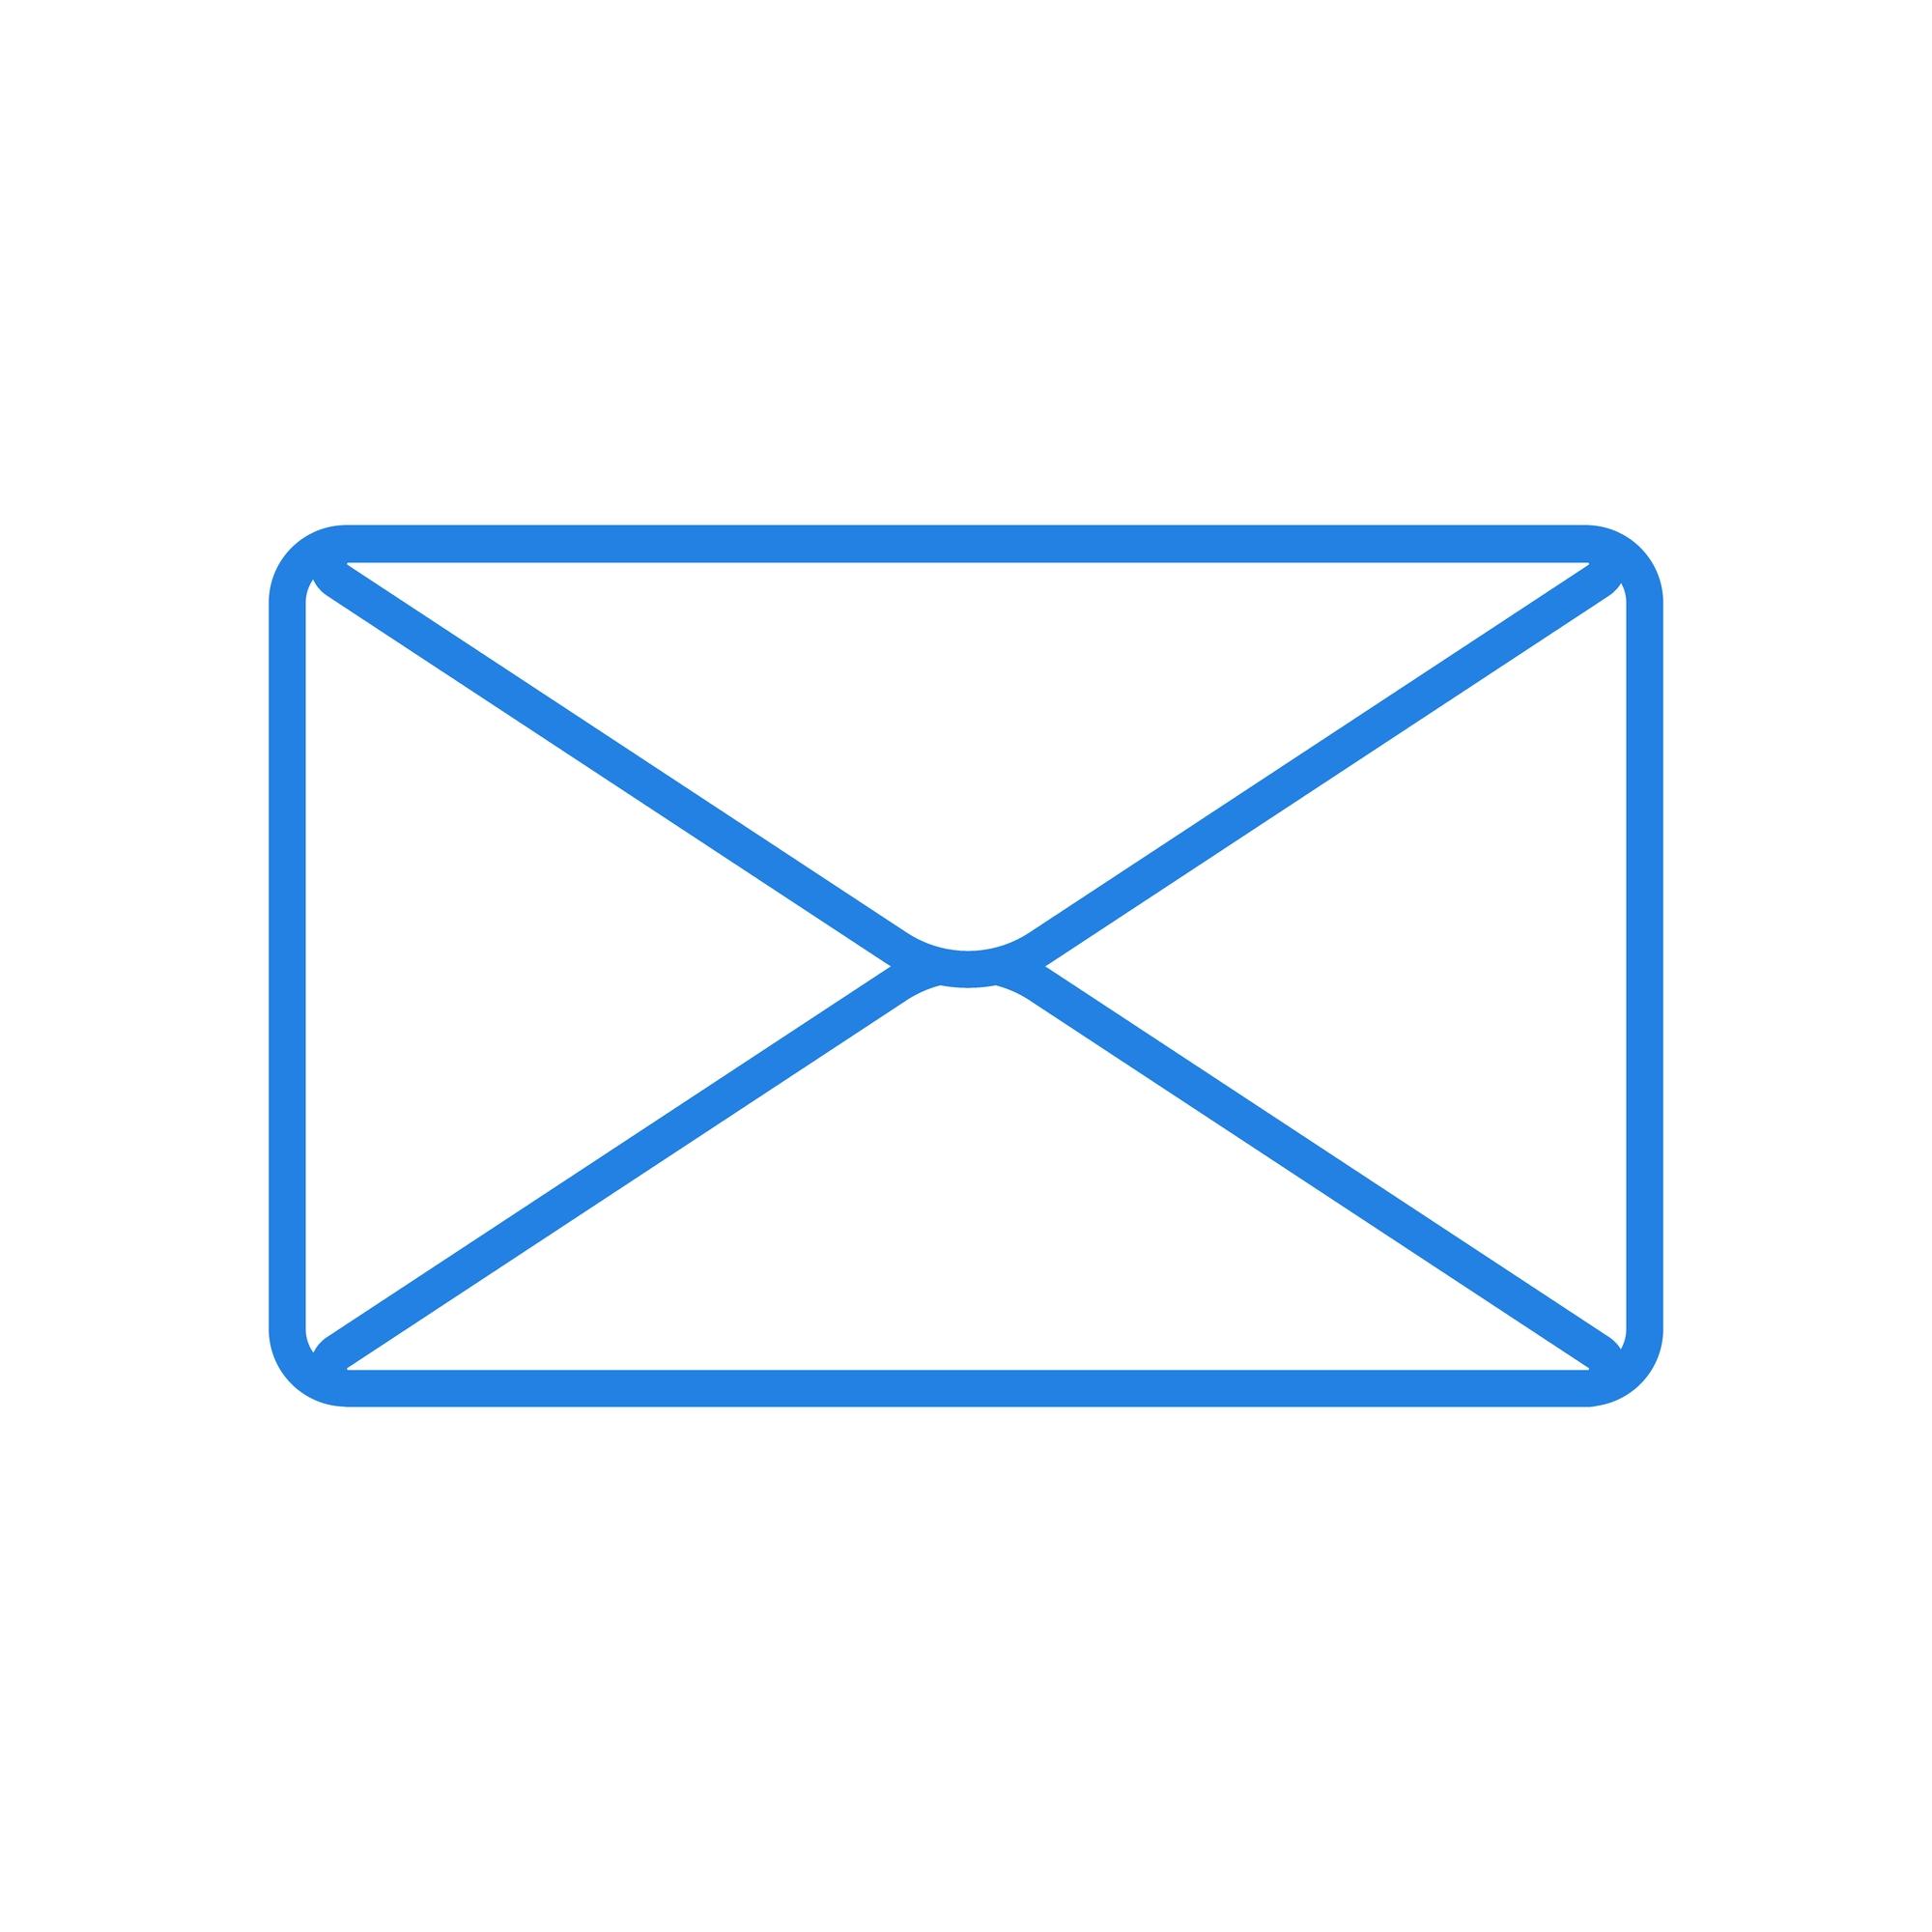 Shutterstock-1987193948 Blue envelope icon. On white background. Vector.